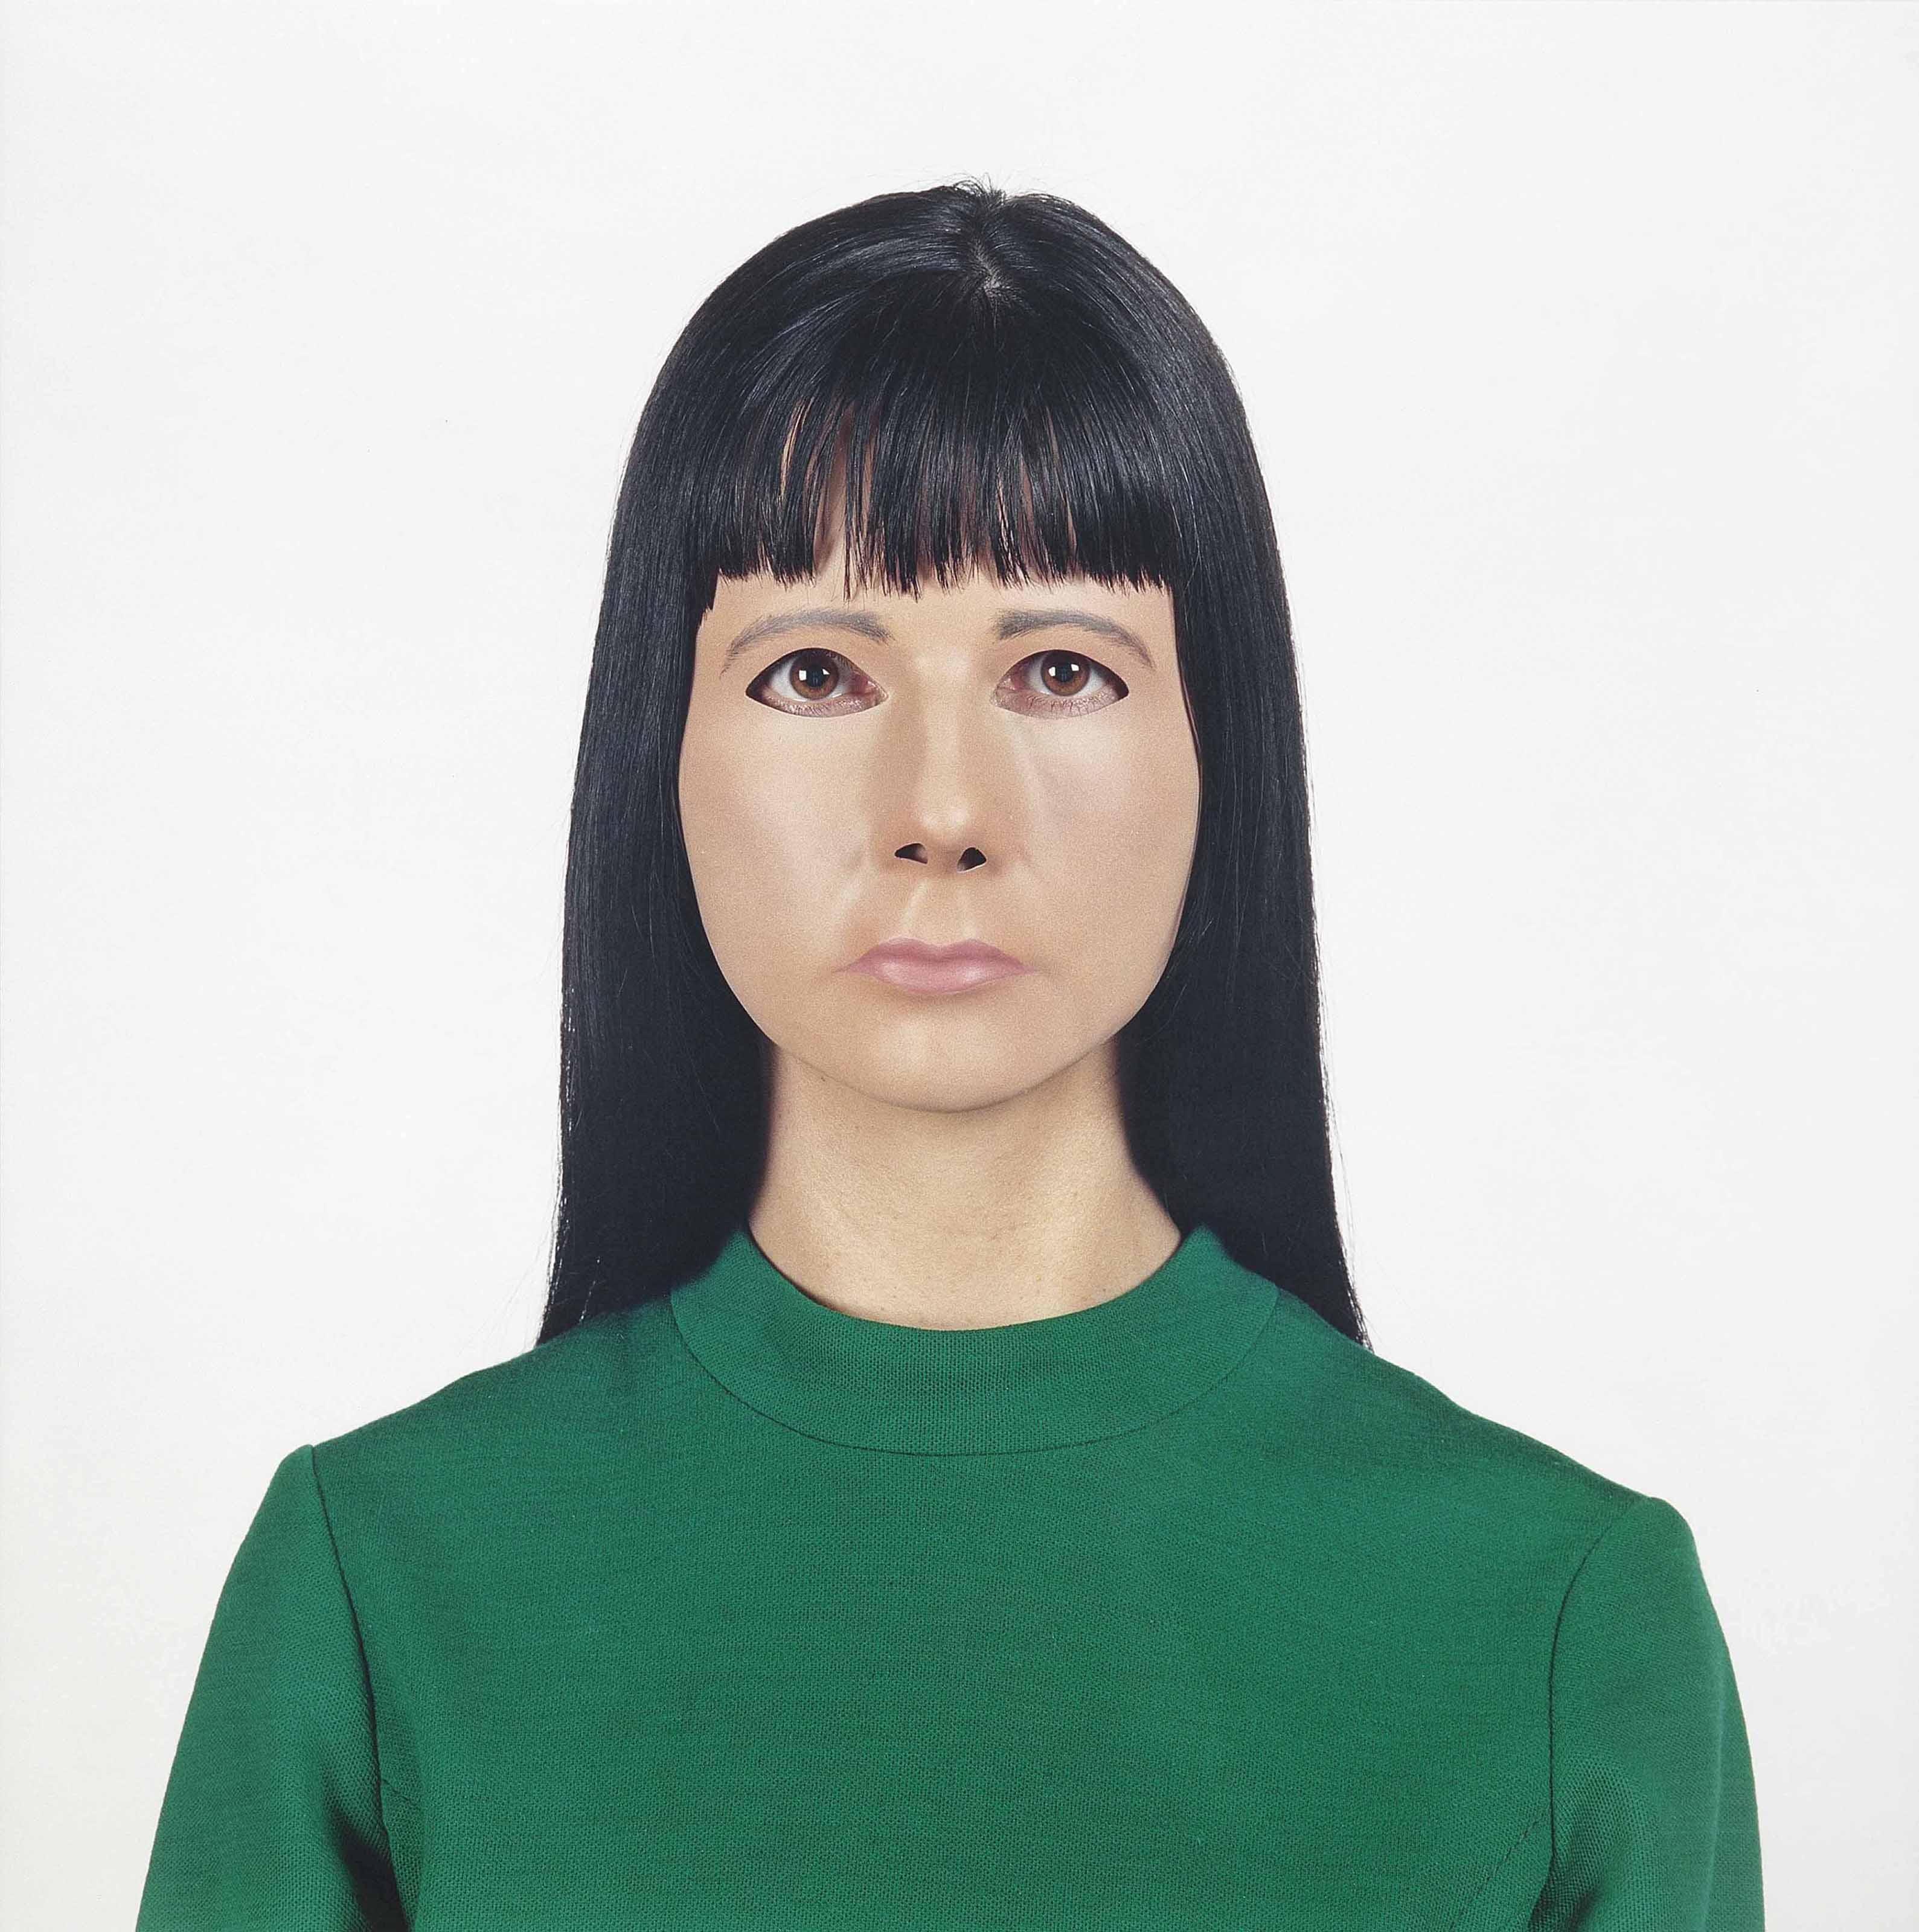 Gillian Wearing (b. 1963)